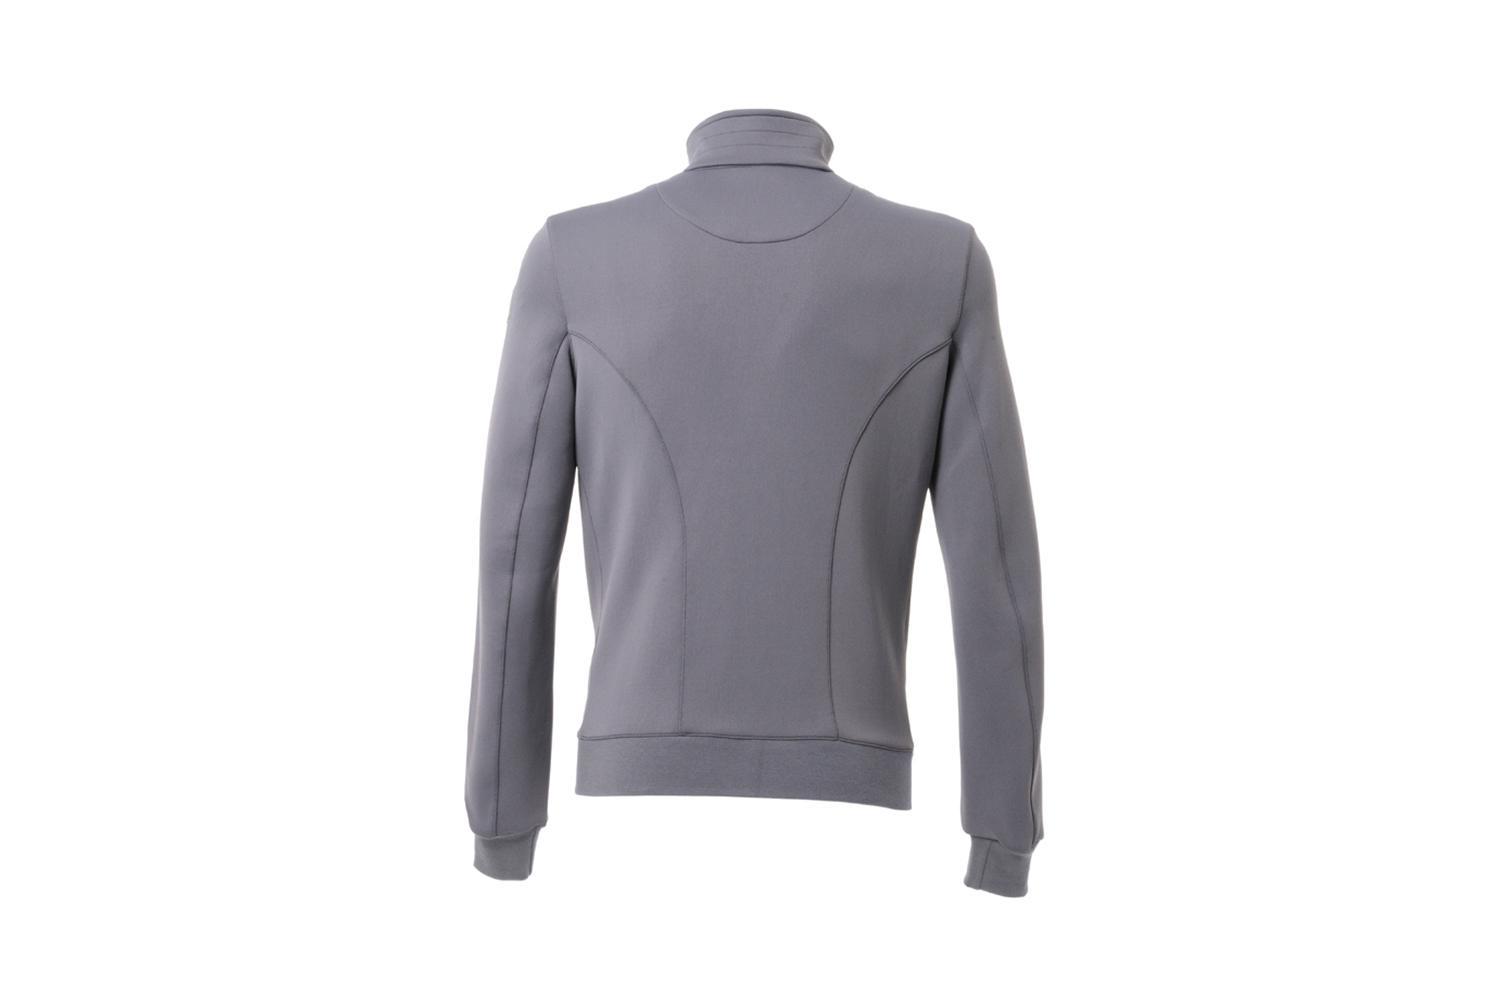 Sweatshirt Grey Pininfarina Store